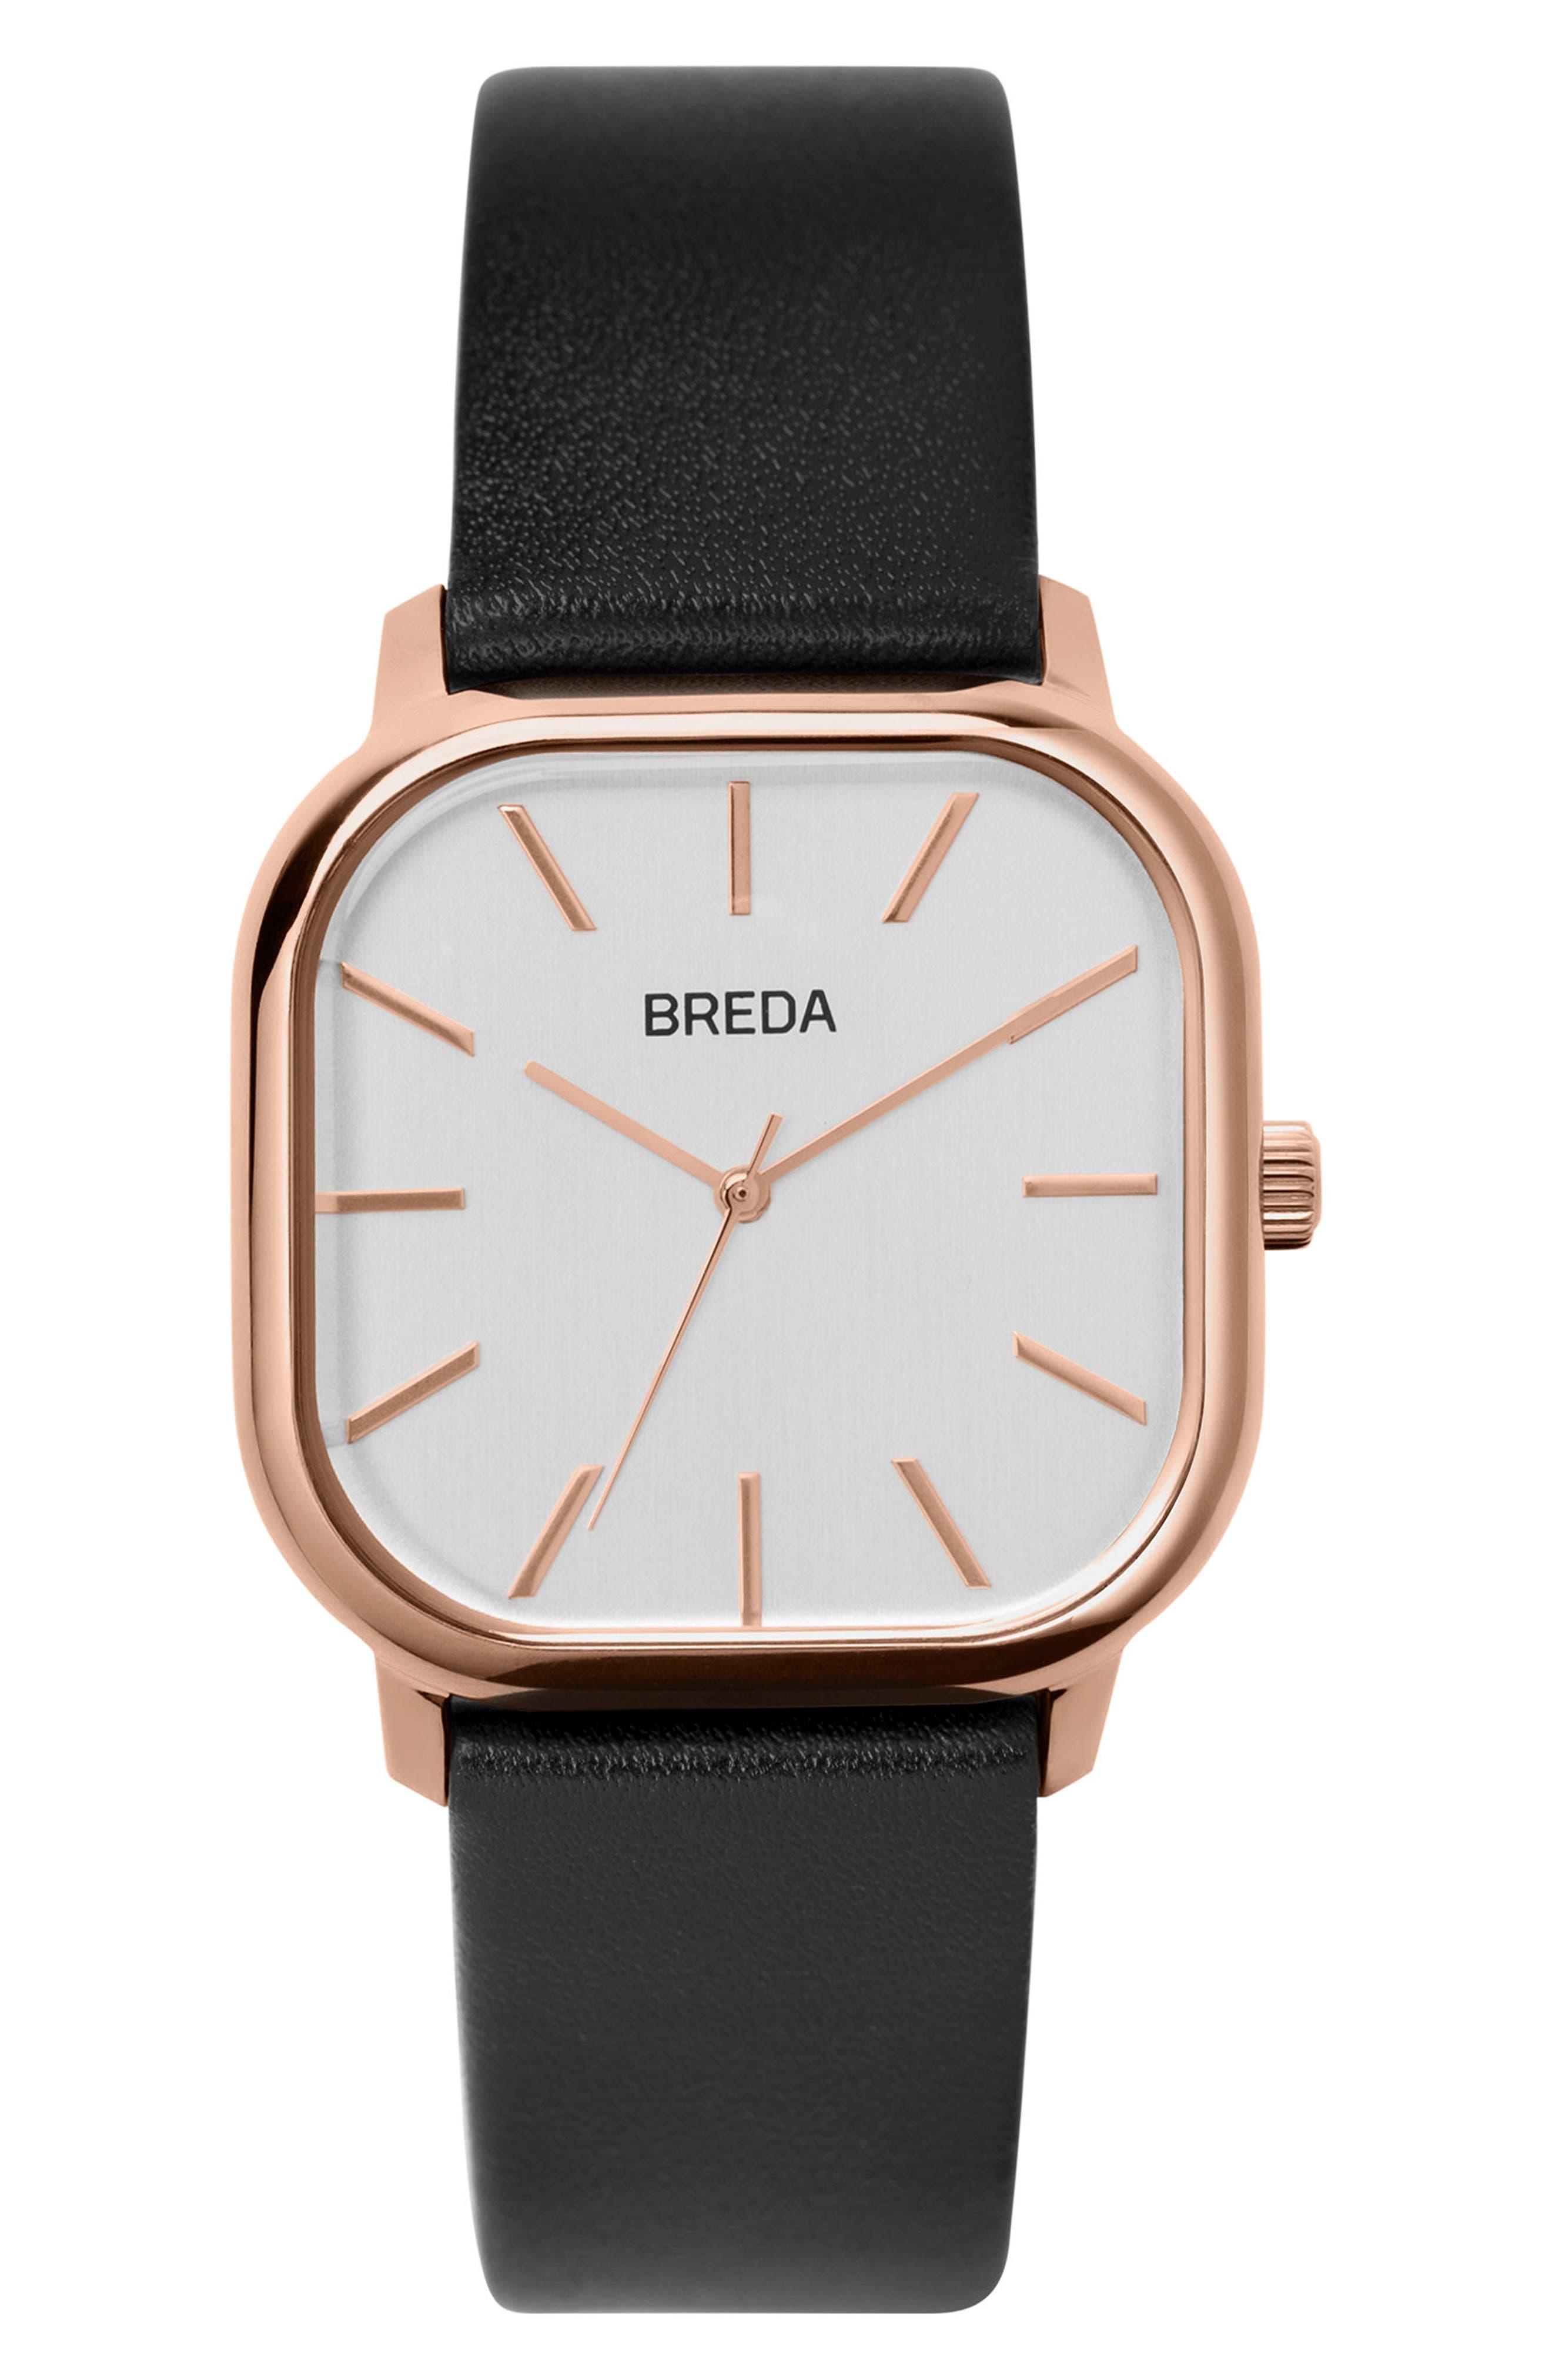 Main Image - BREDA Visser Square Leather Strap Watch, 35mm